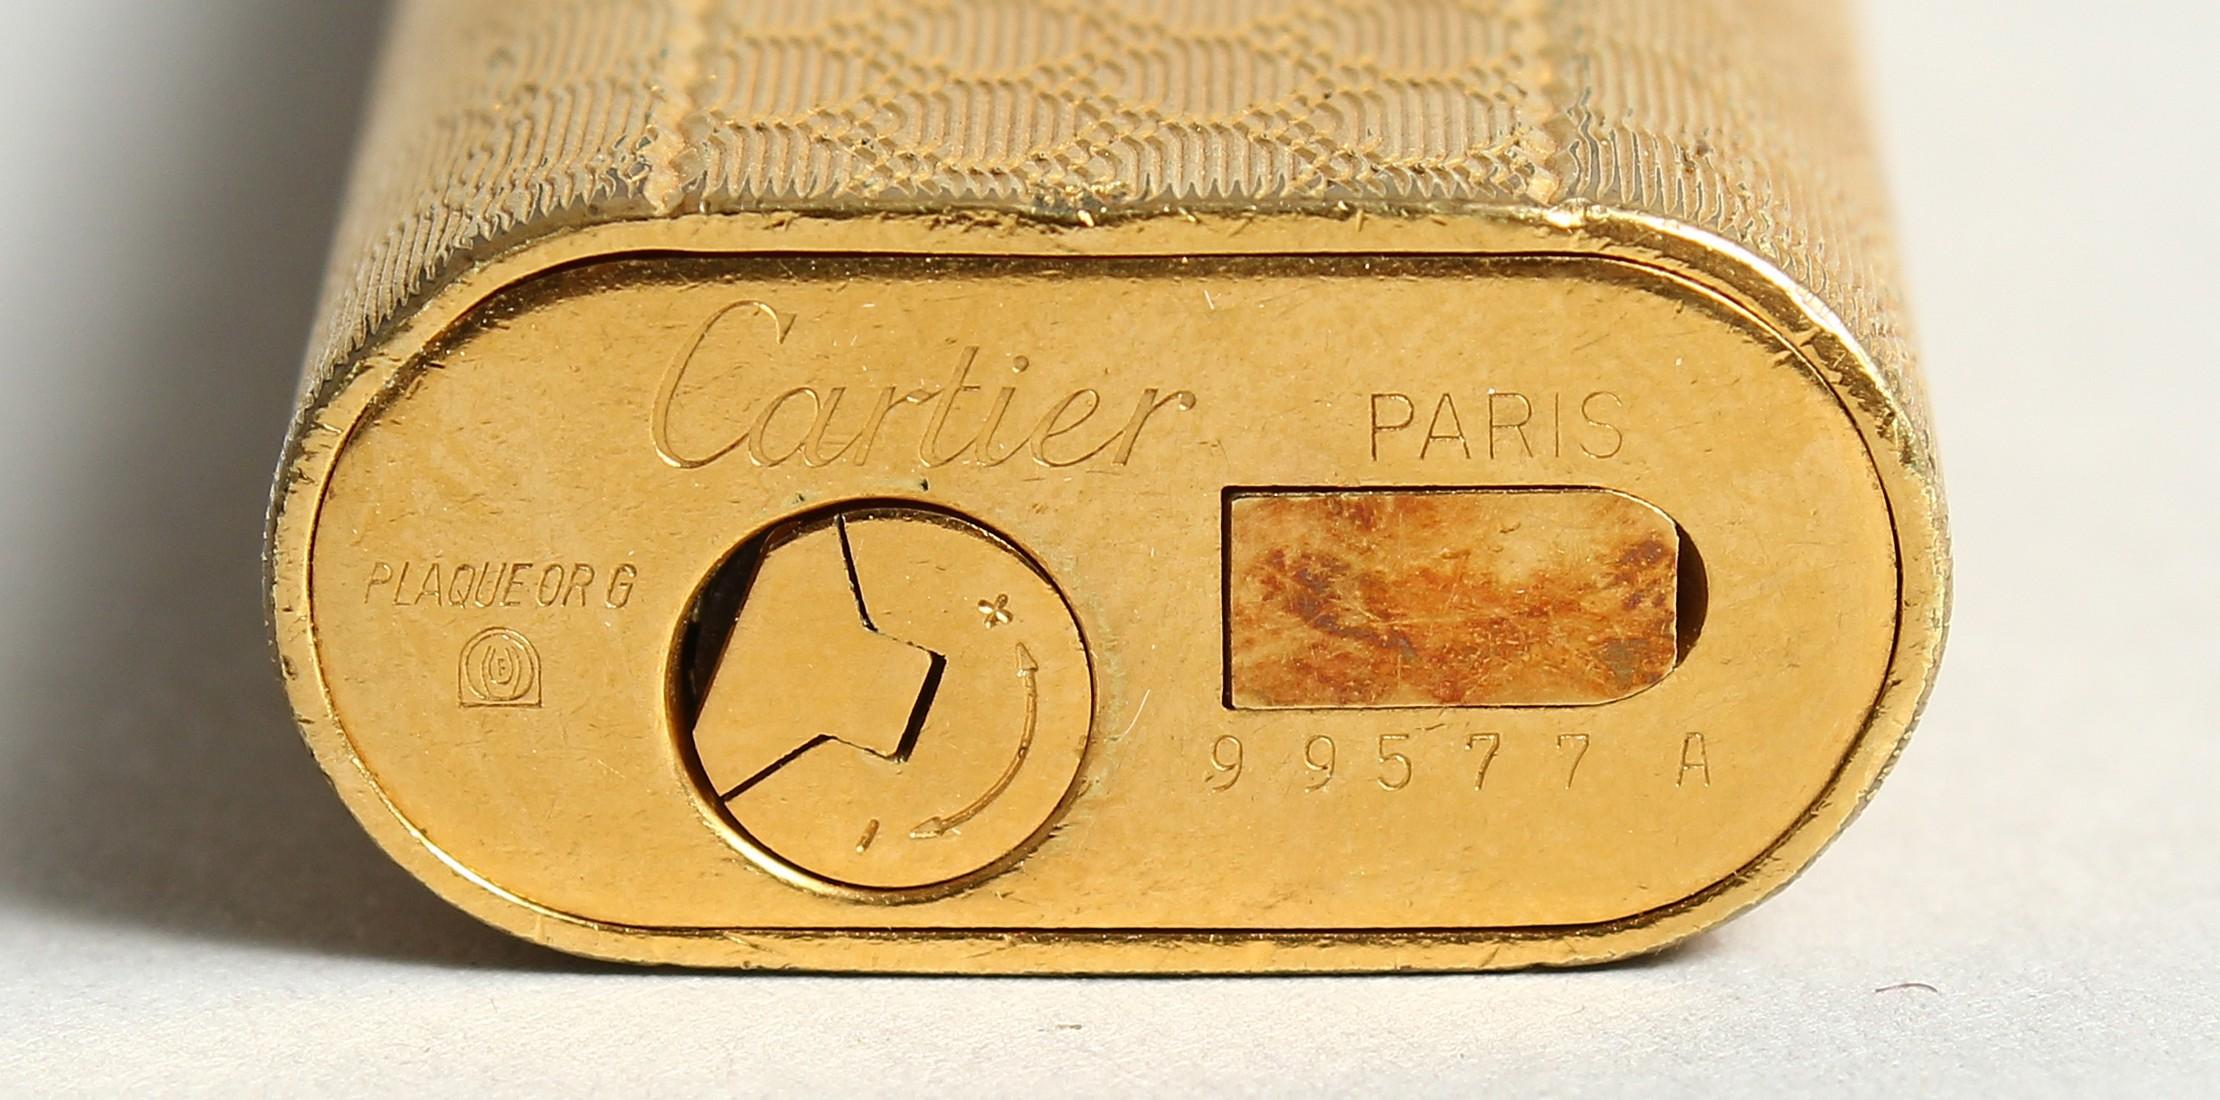 A GOOD CARTIER LIGHTER in original box. - Image 5 of 9